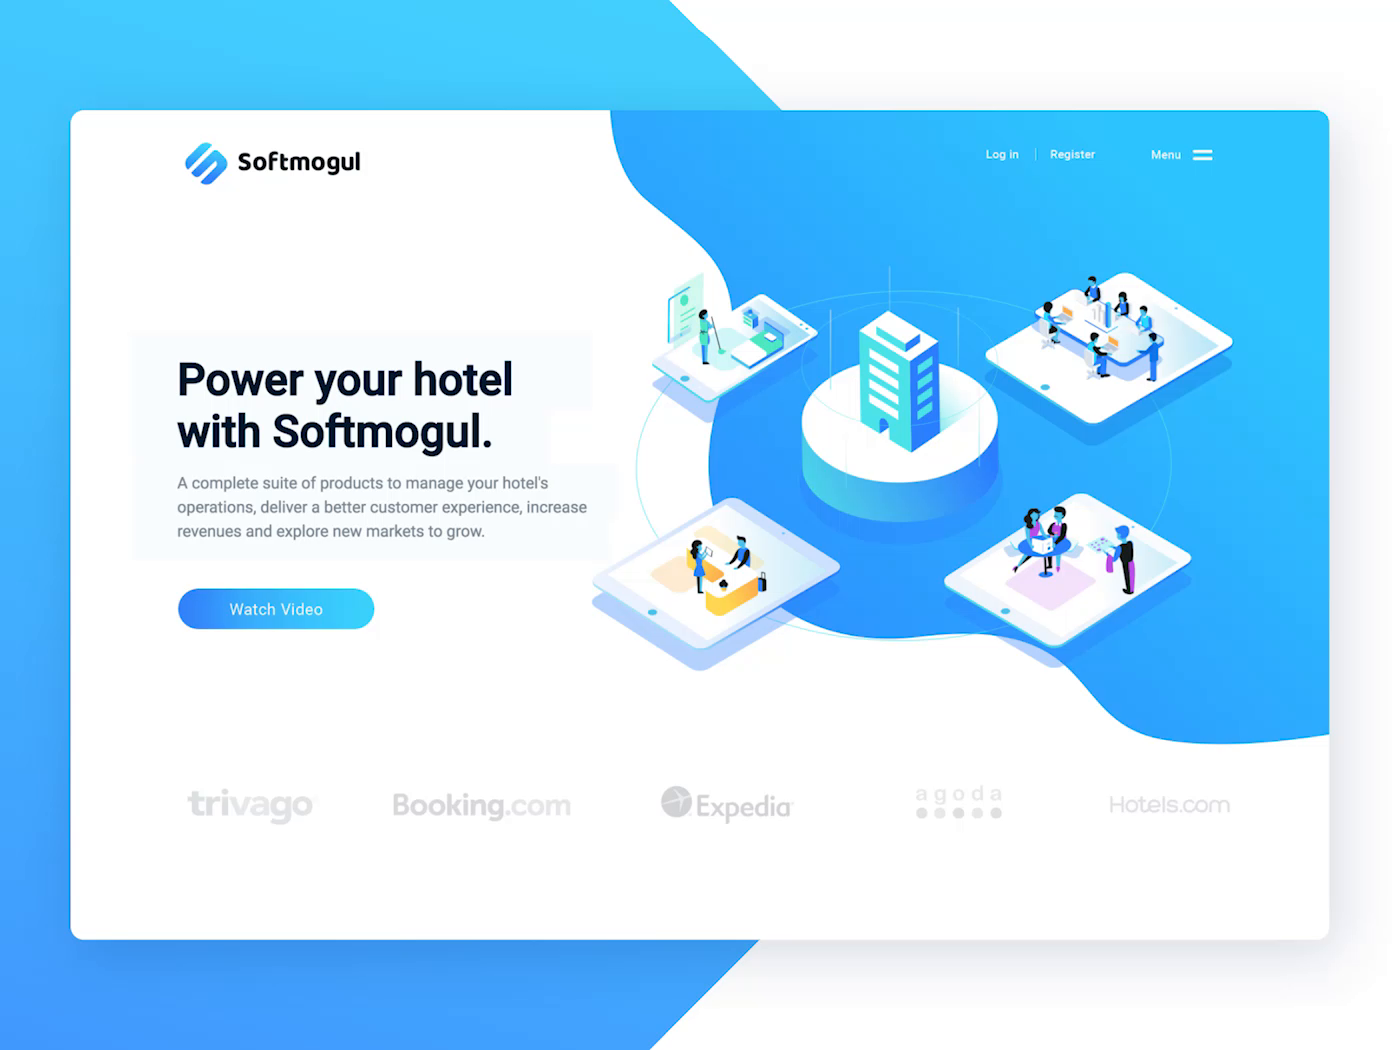 Web Preview Softmogul By Aldo Hysenaj Hotel Operations Customer